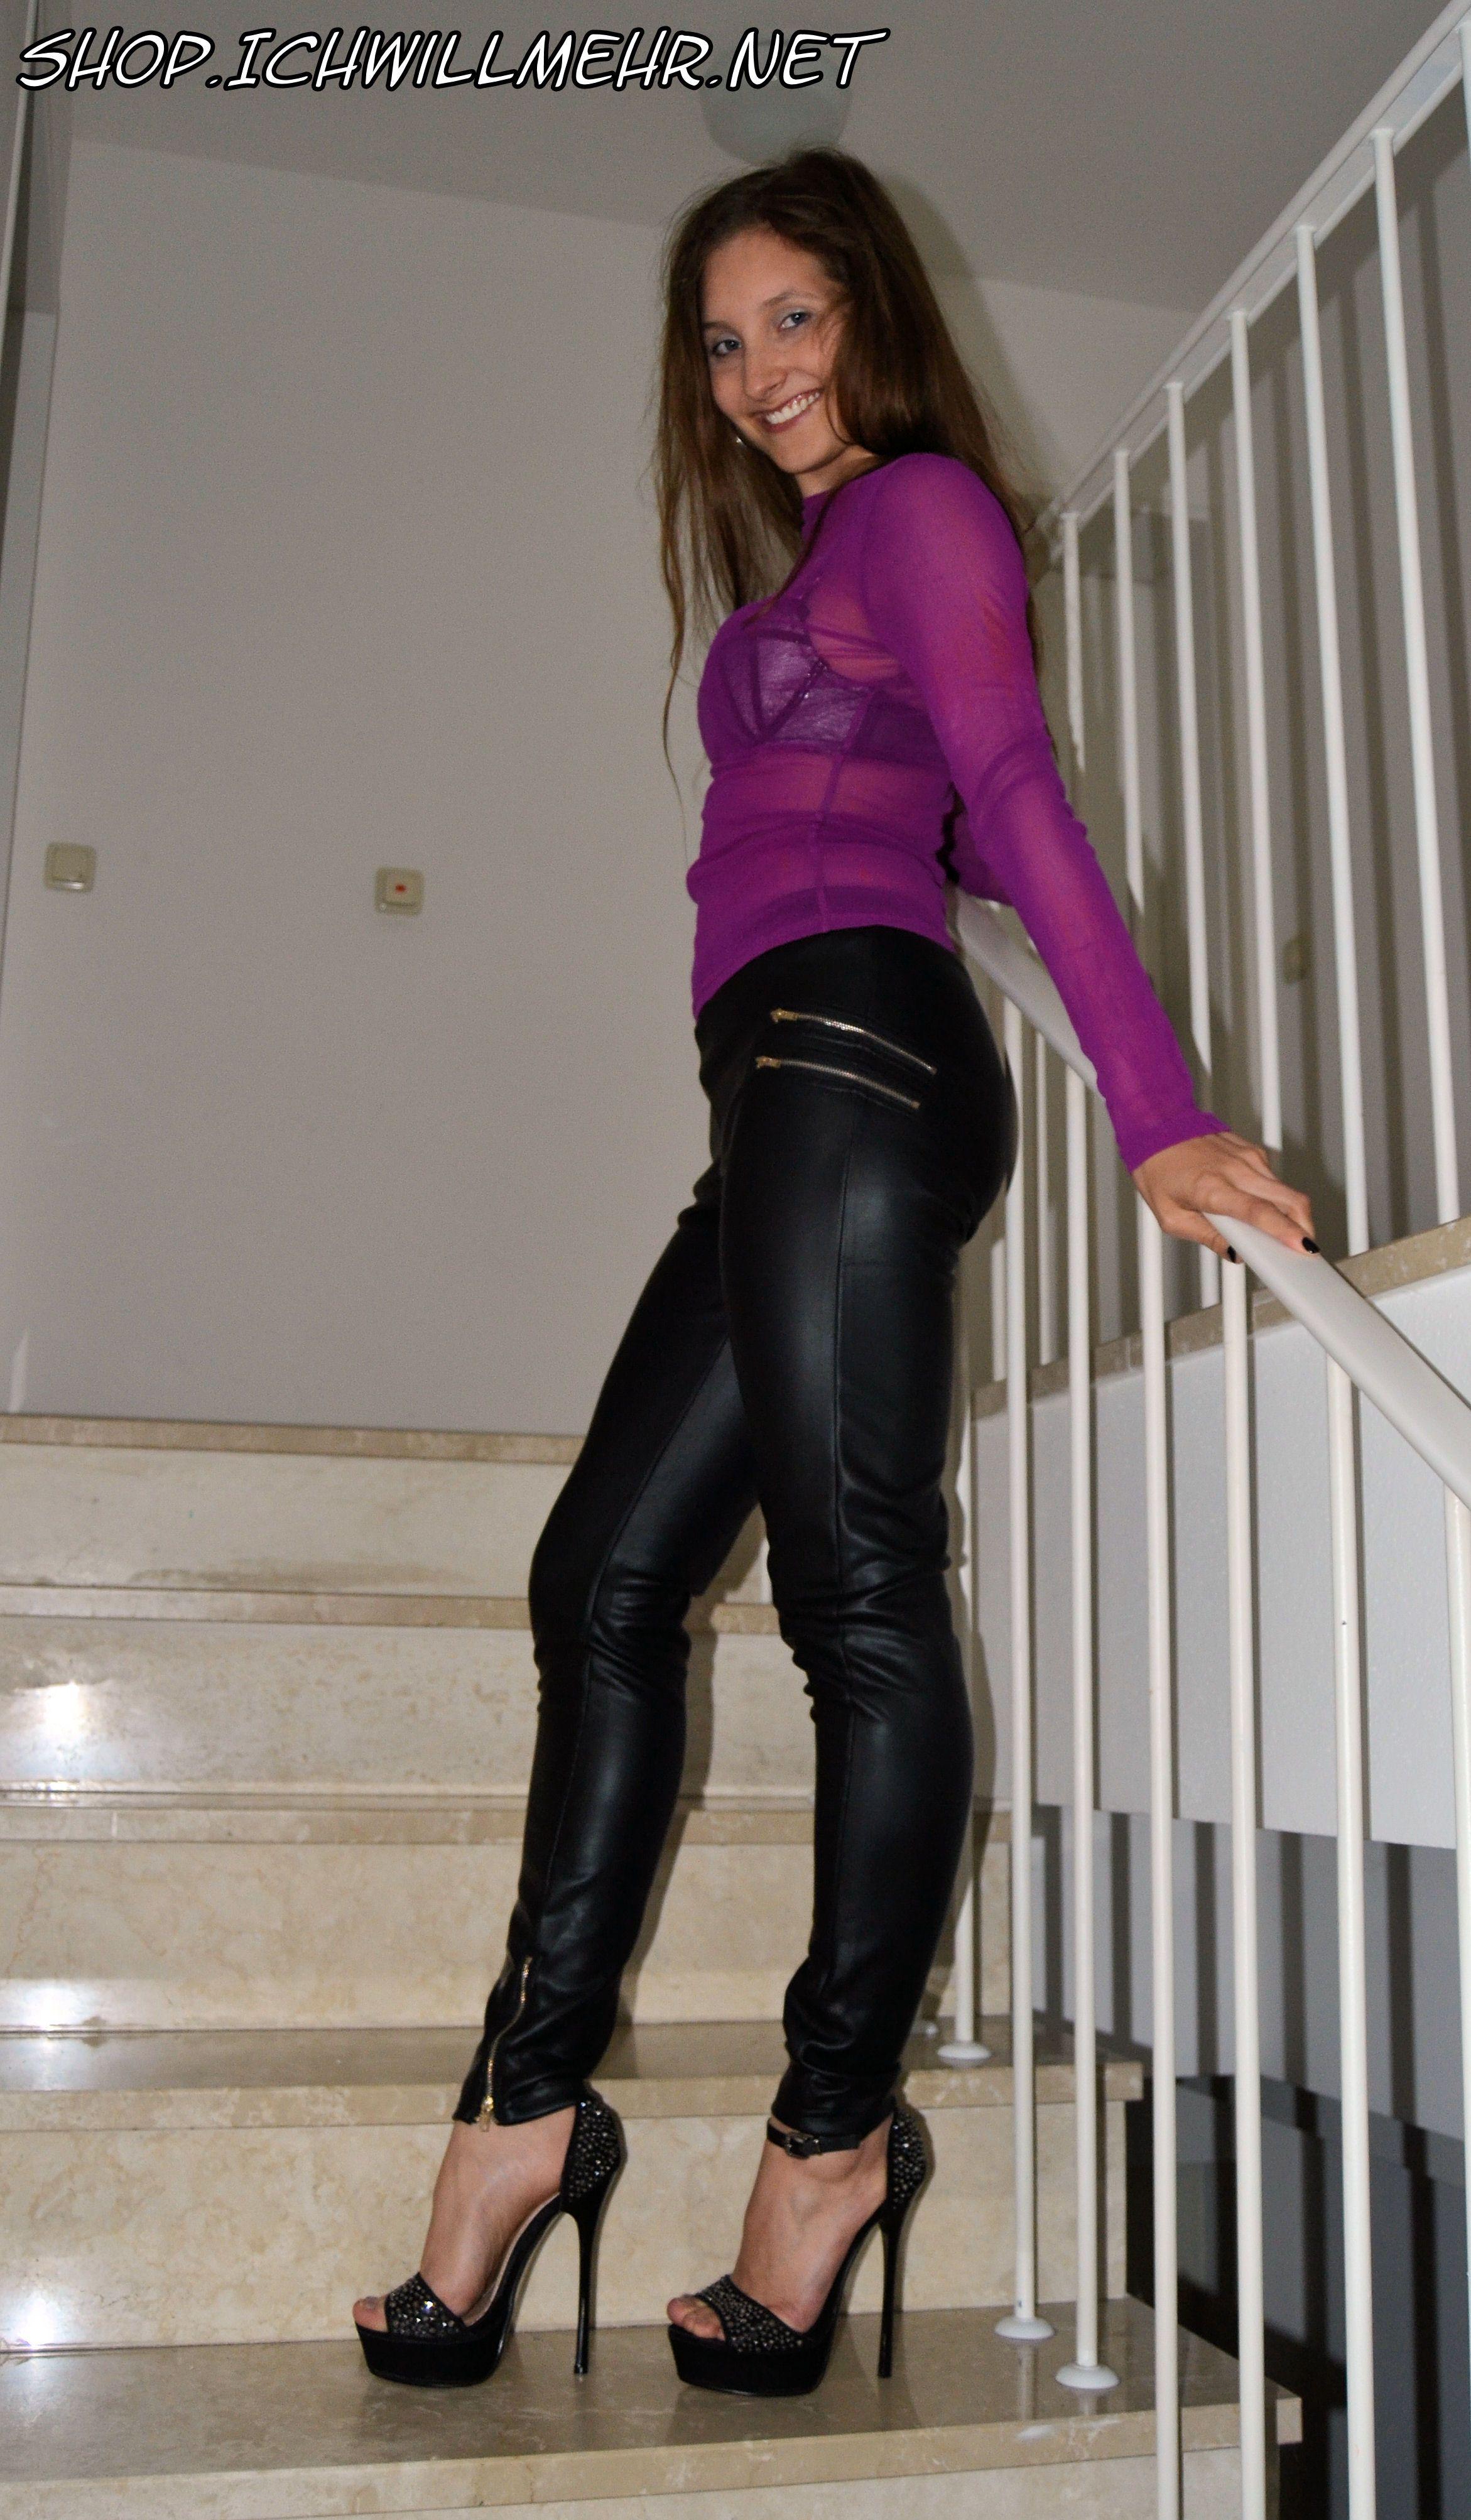 Leather Leggings, Shiny Leggings, Leather Fashion, Sexy Legs, High Heel,  Style, Sexy Women, Skinny, Beautiful Women